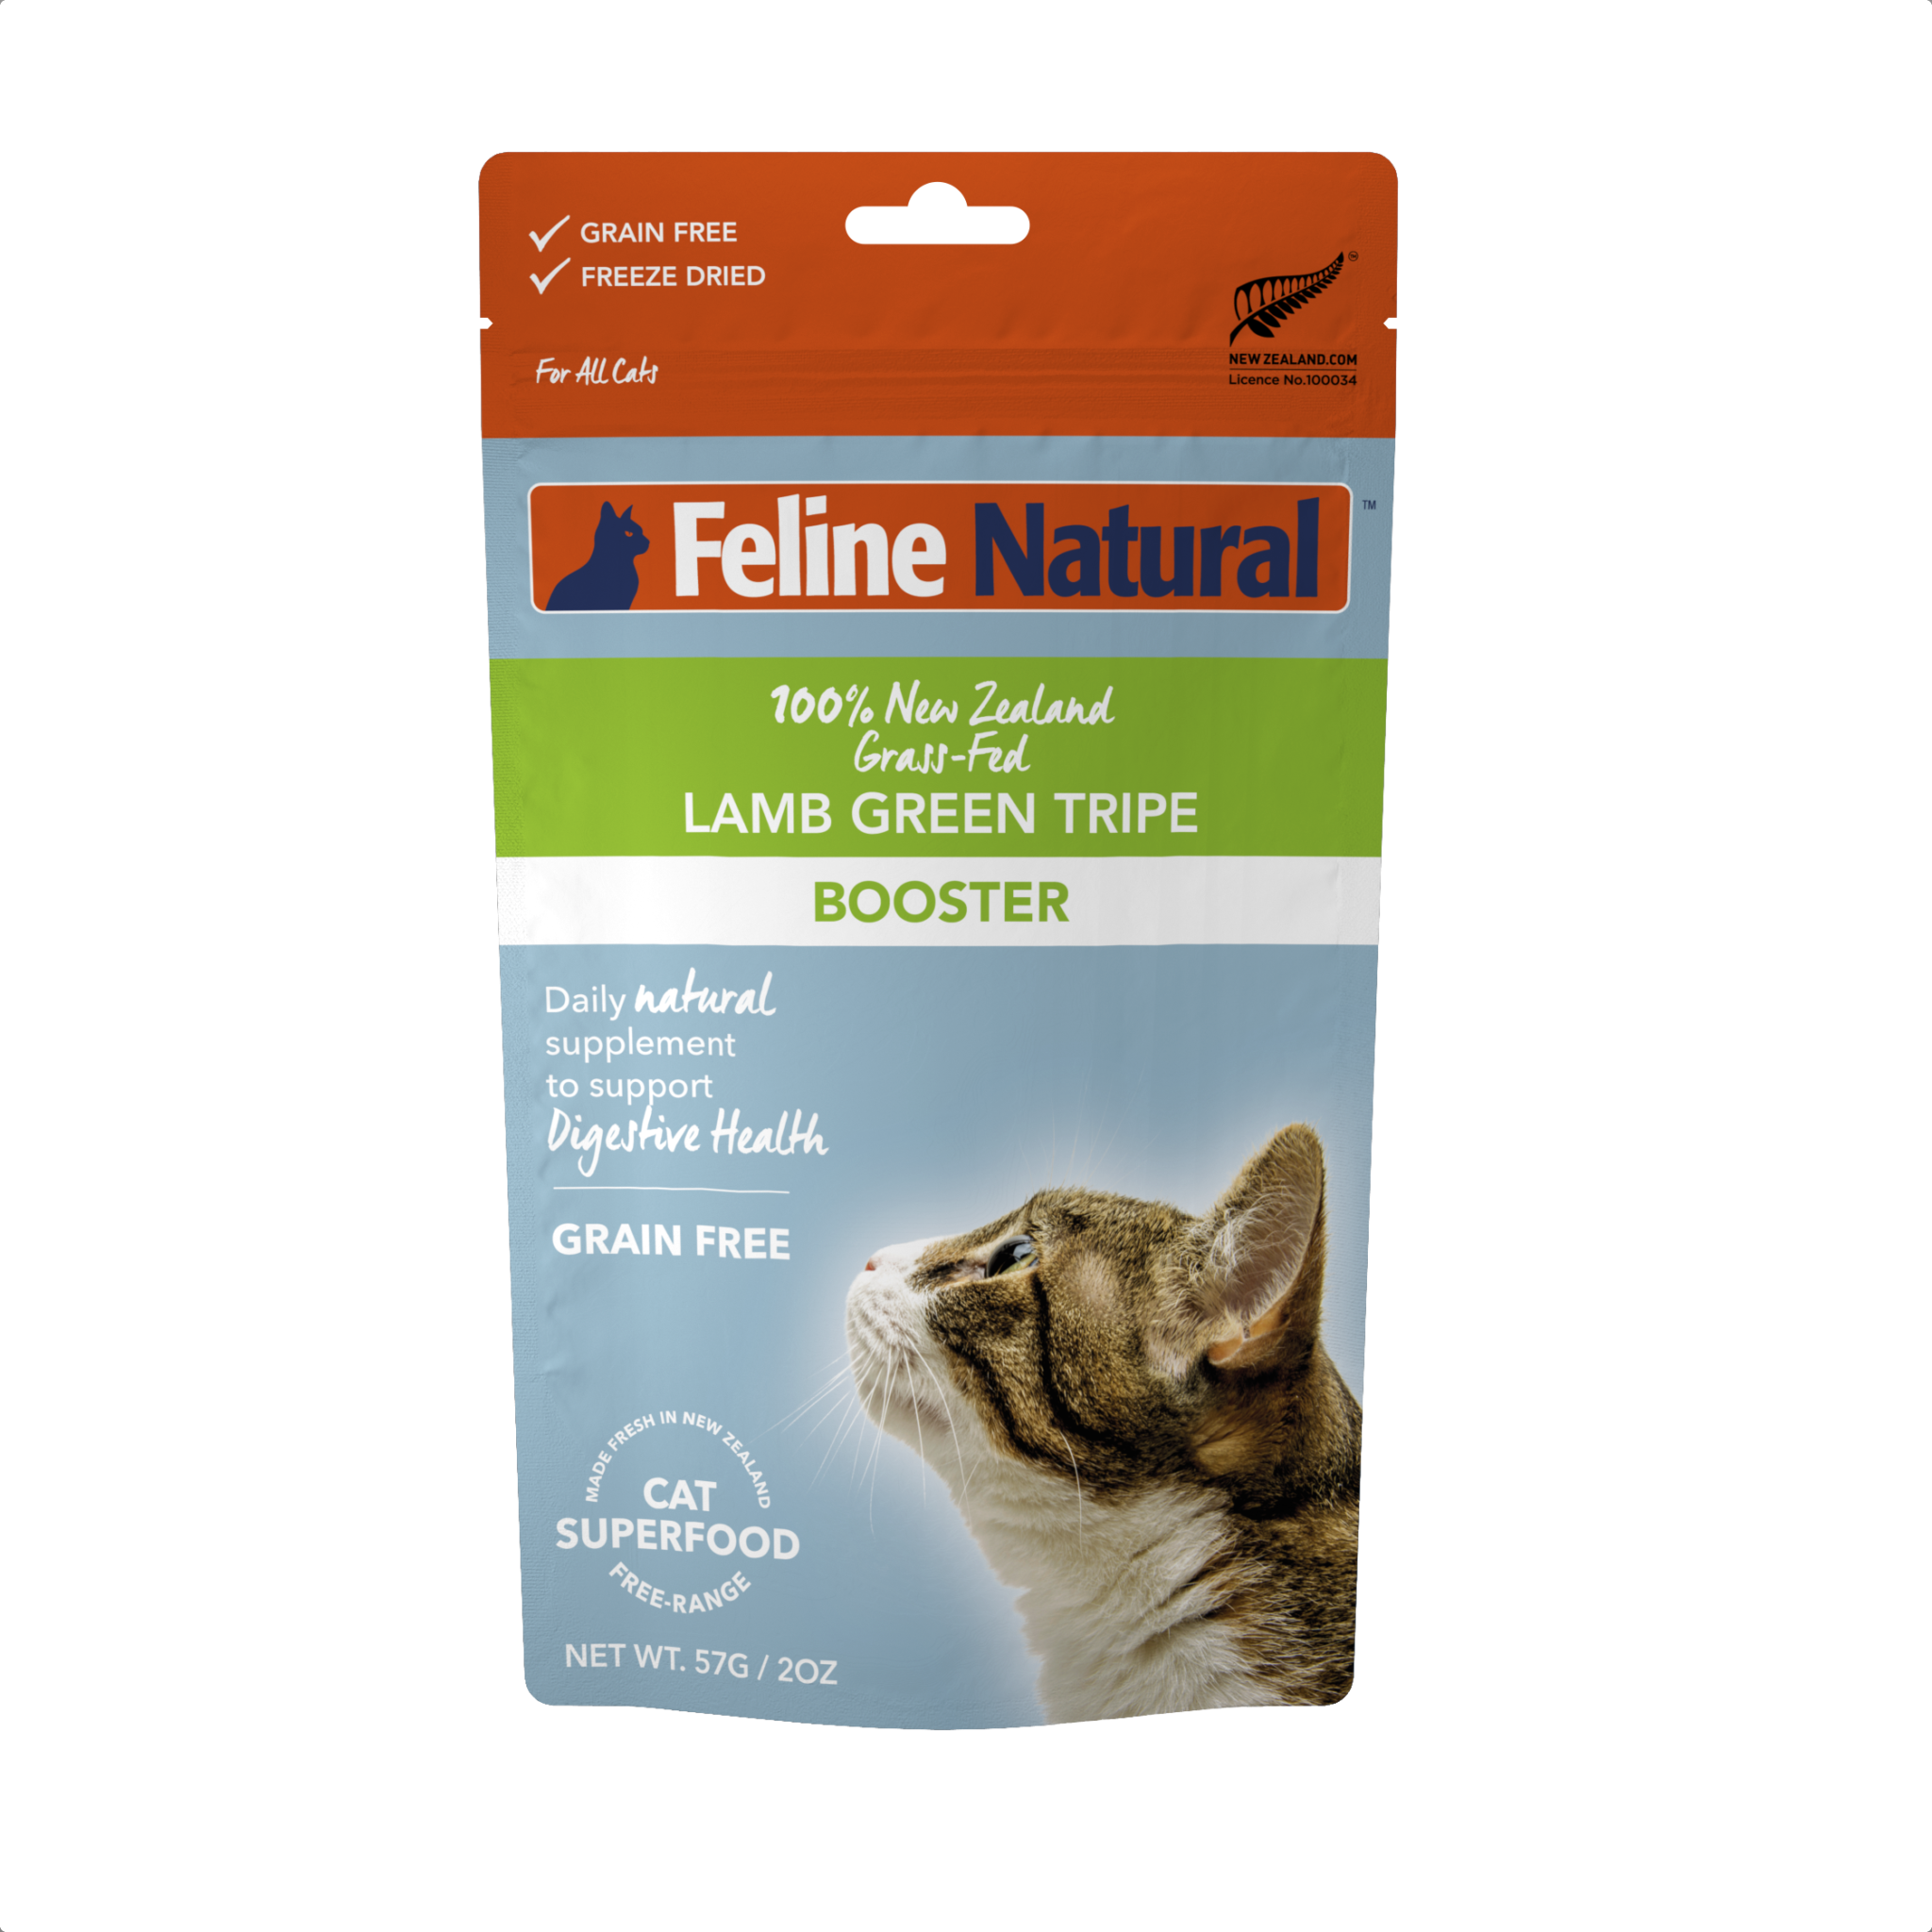 Feline Natural Feline Natural Lamb Green Tripe Booster Freeze Dried Cat Food 2oz